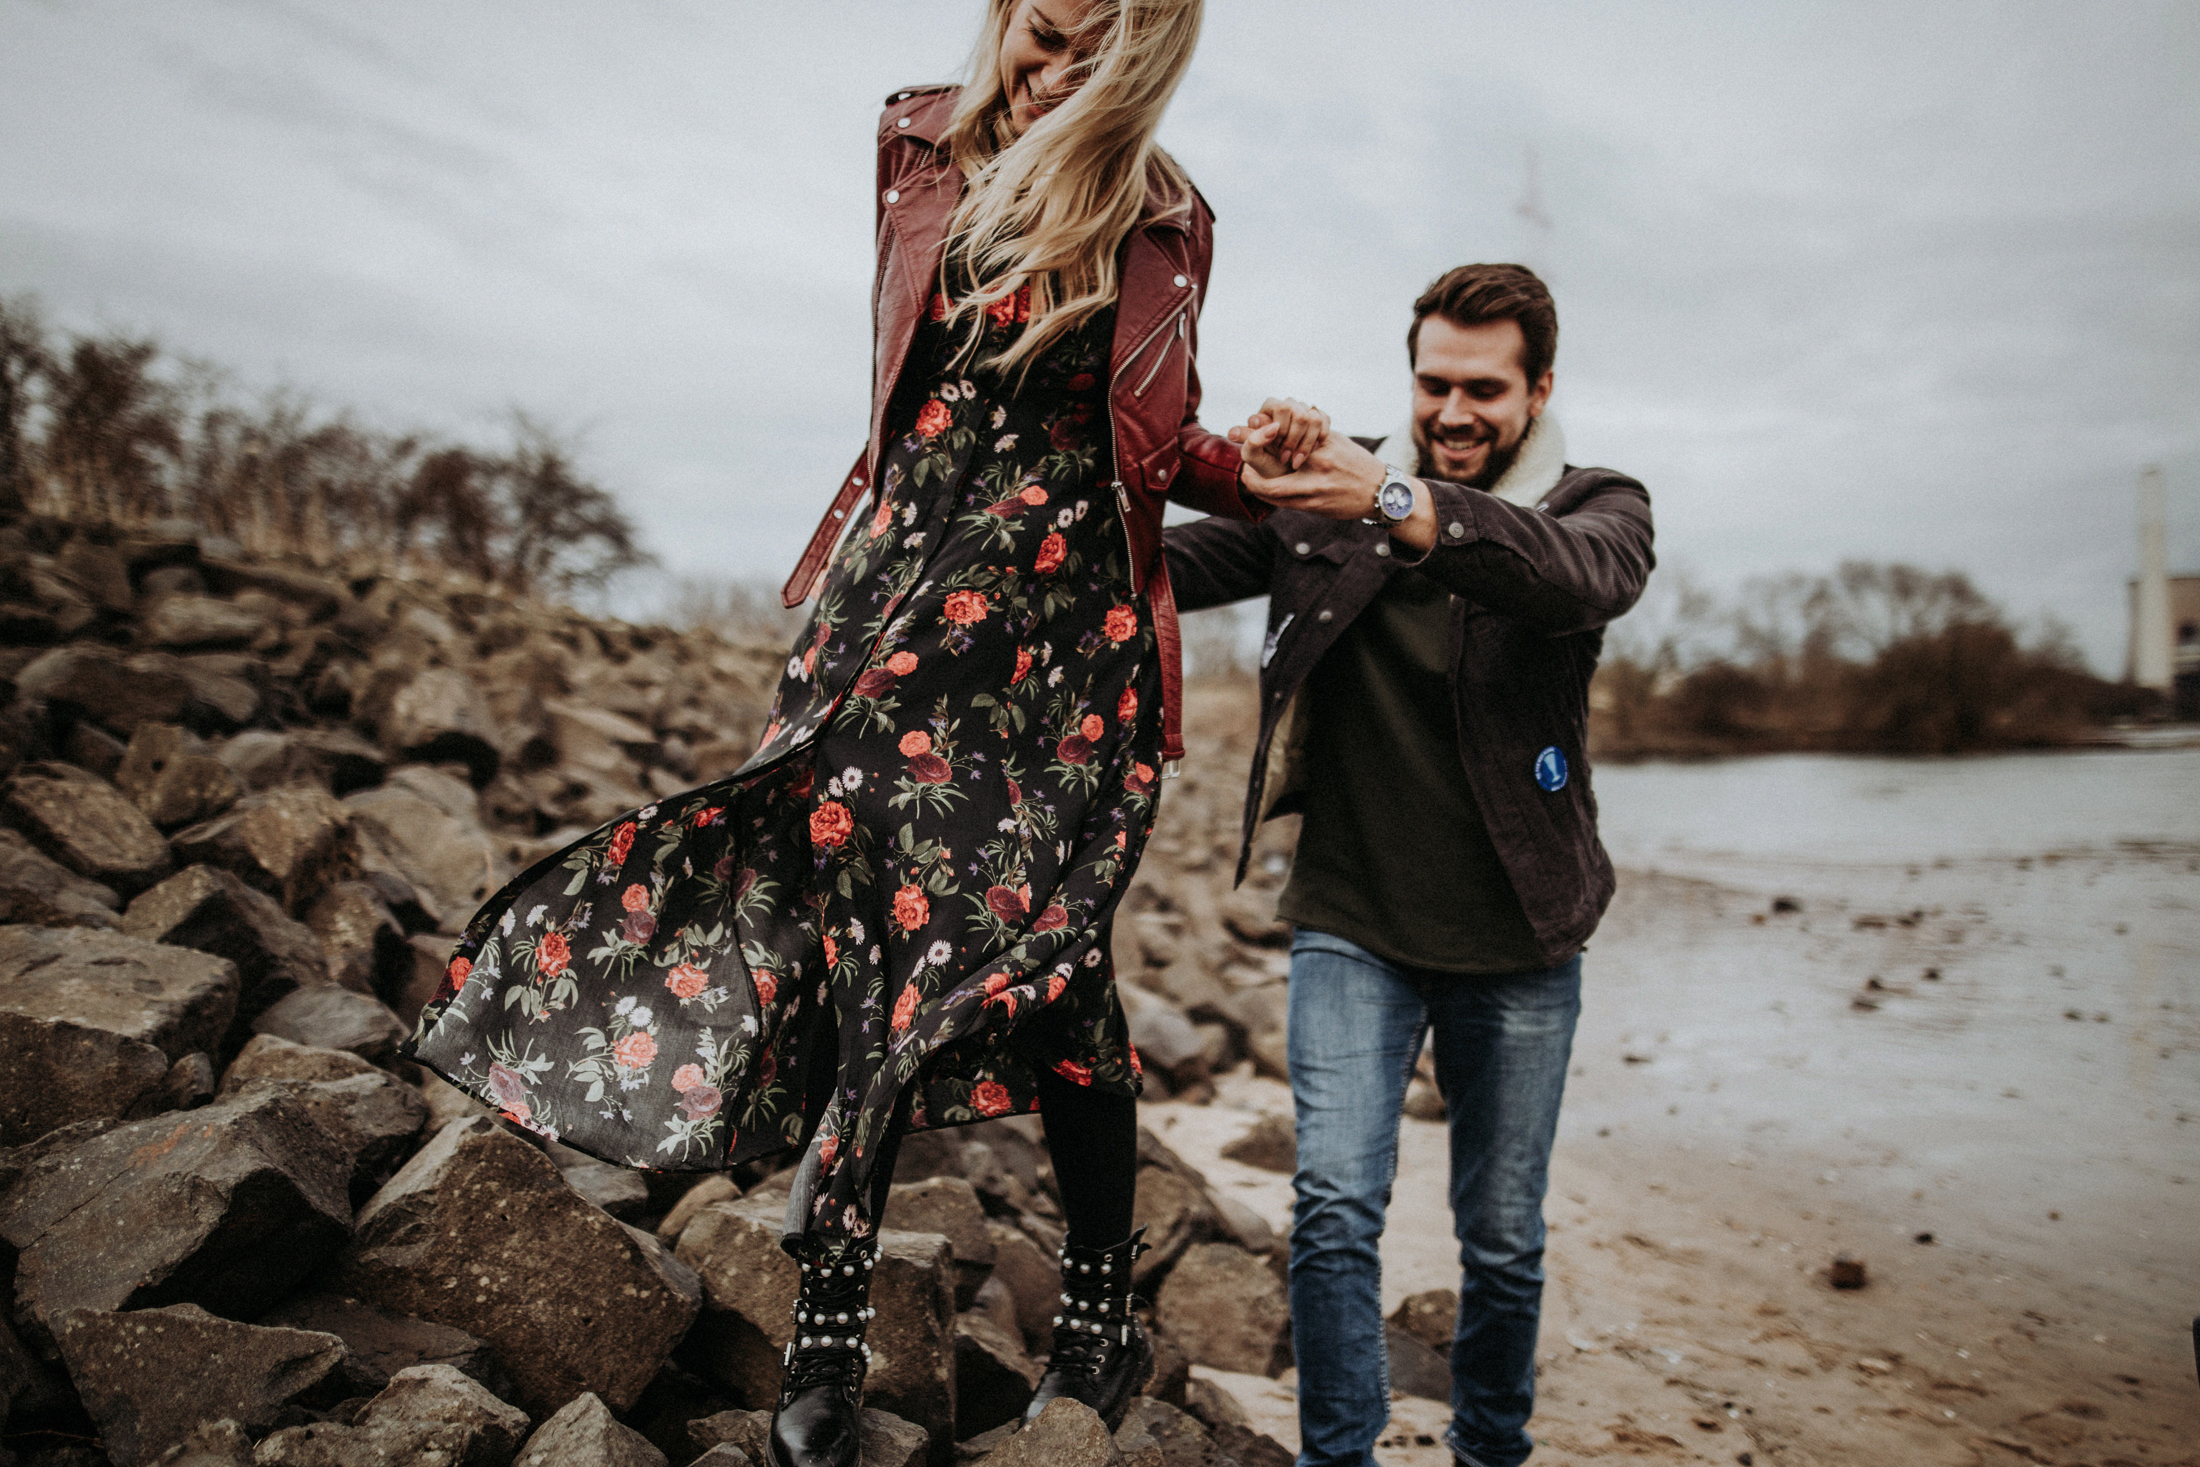 Wedding_Photographer_Mallorca_DanielaMarquardt_Photography_CanaryIslands_Lanzarote_Iceland_Tuscany_Santorini_Portugal_NewYork_Spain_Elopement_Hochzeitsfotograf_CK33